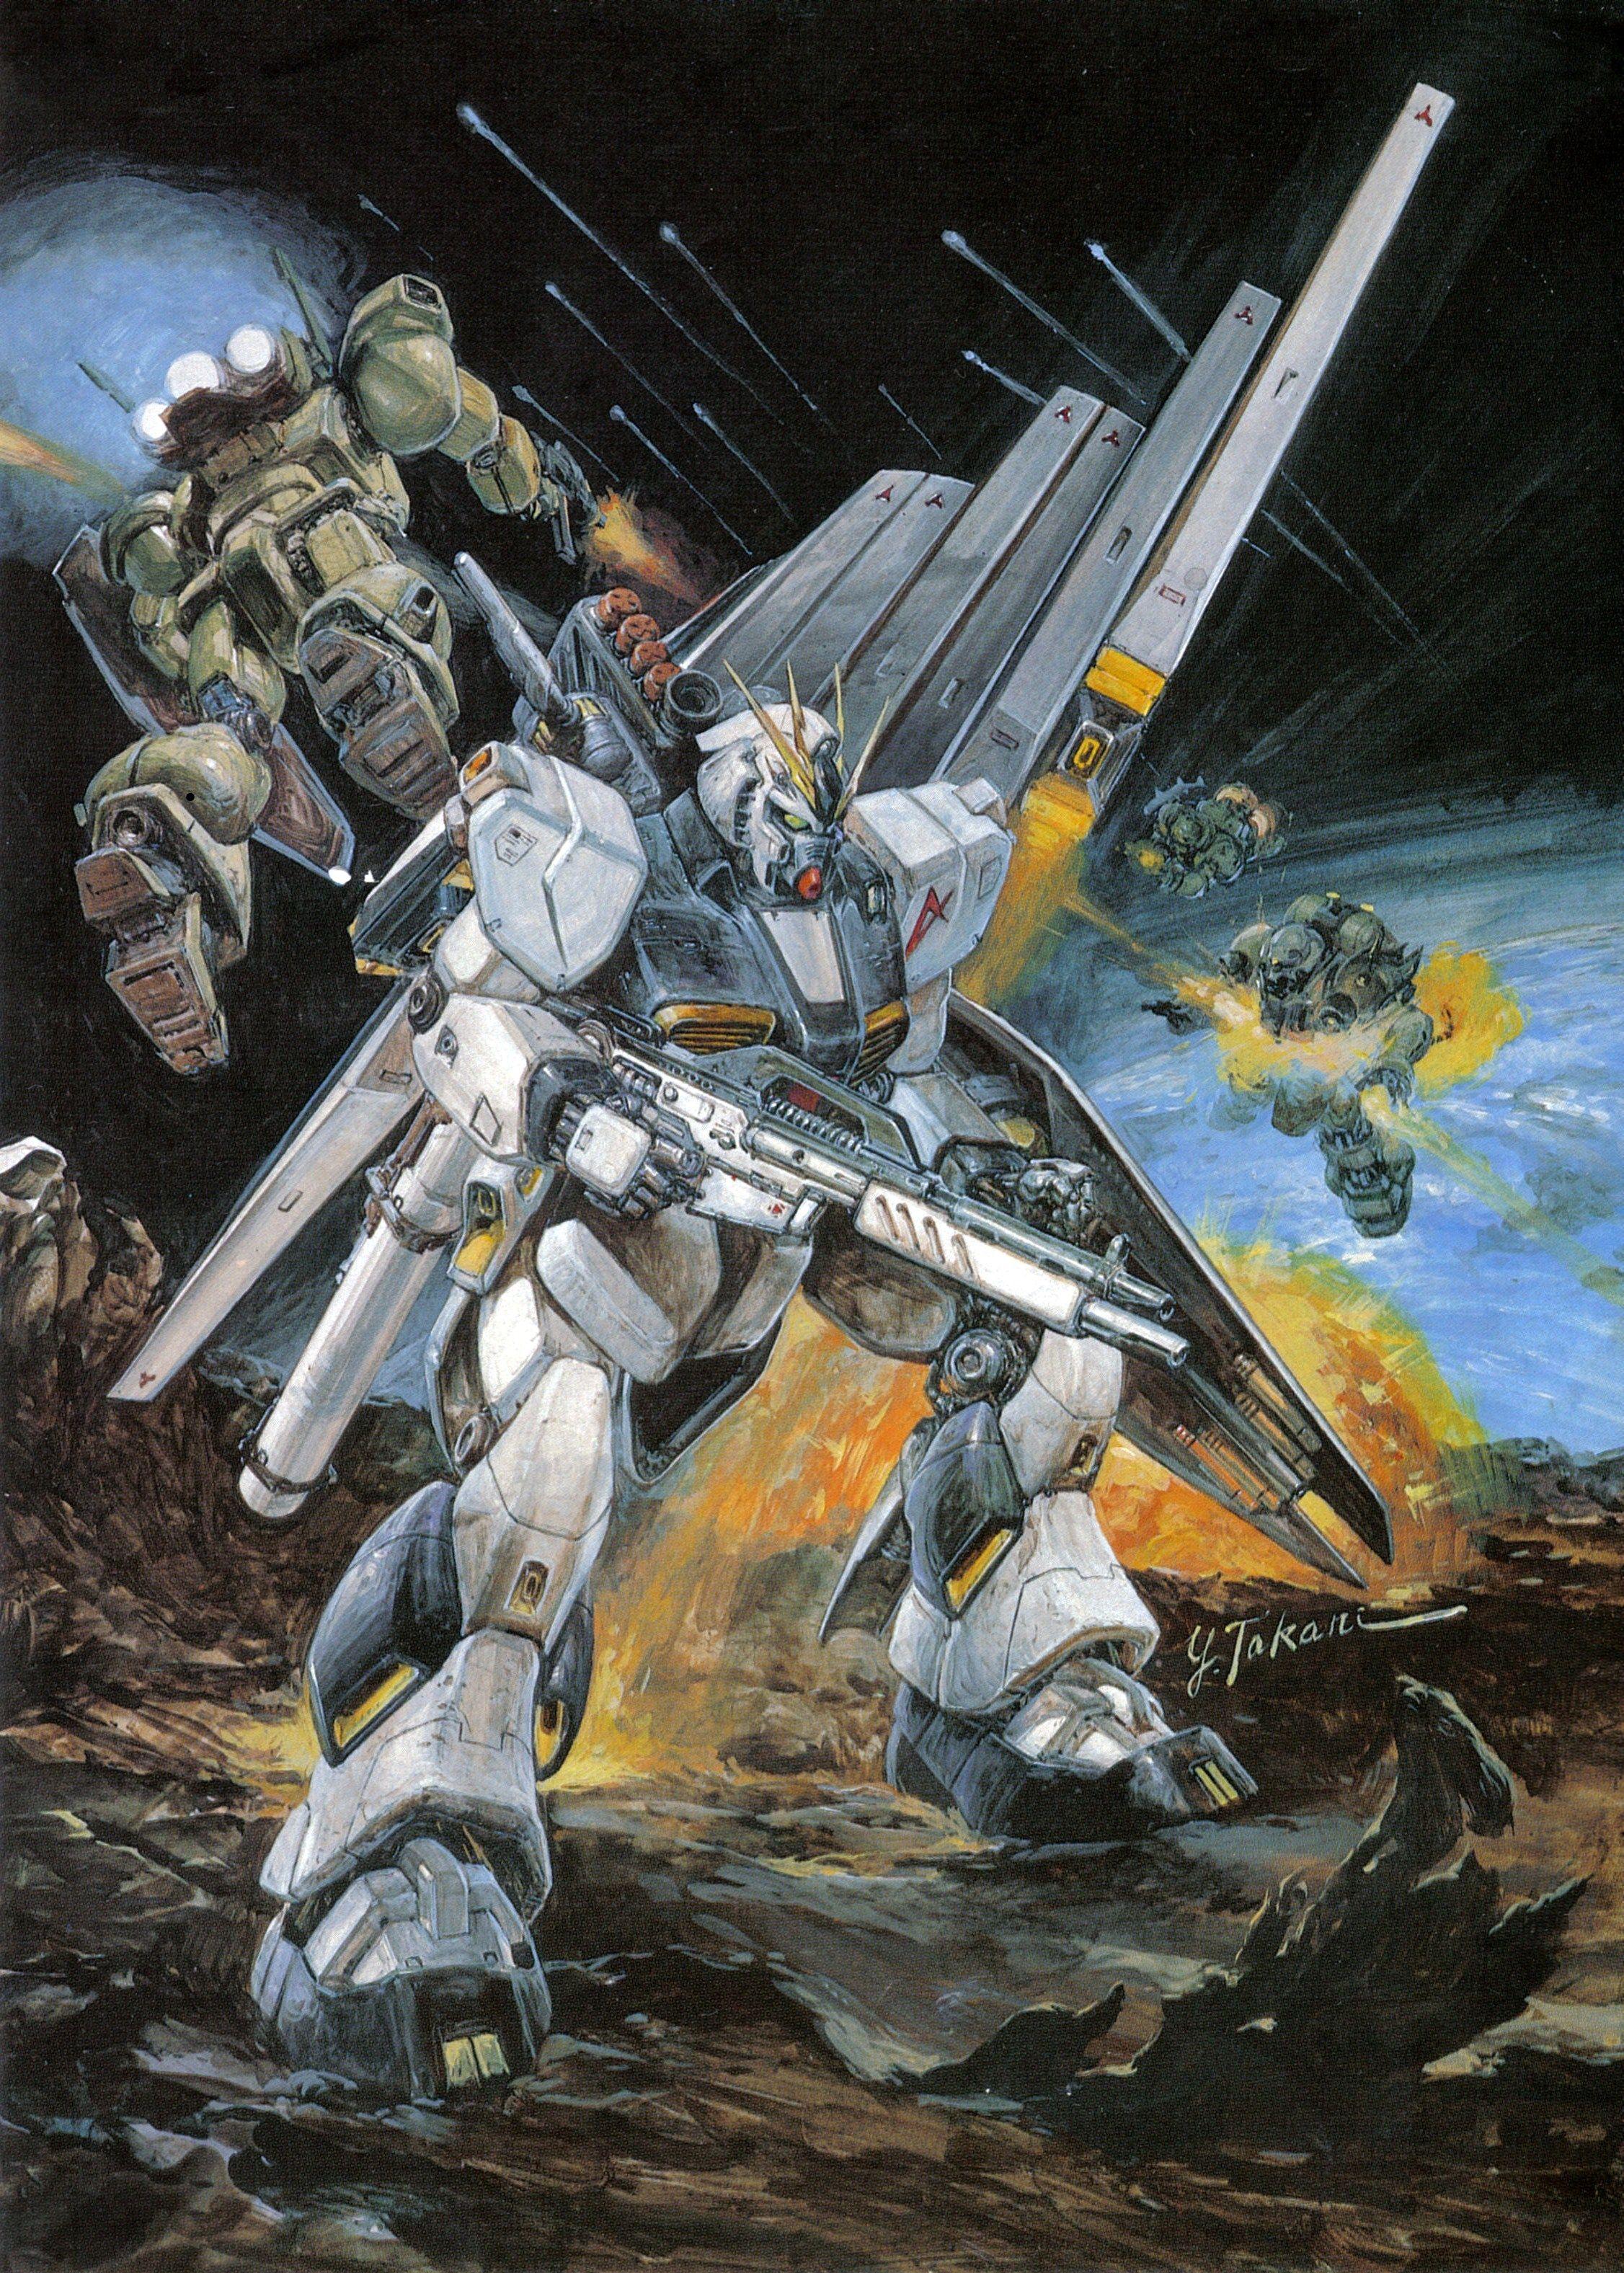 314756321 E3db7aaf21 Jpg 2253 3153 Gundam Art Gundam Gundam